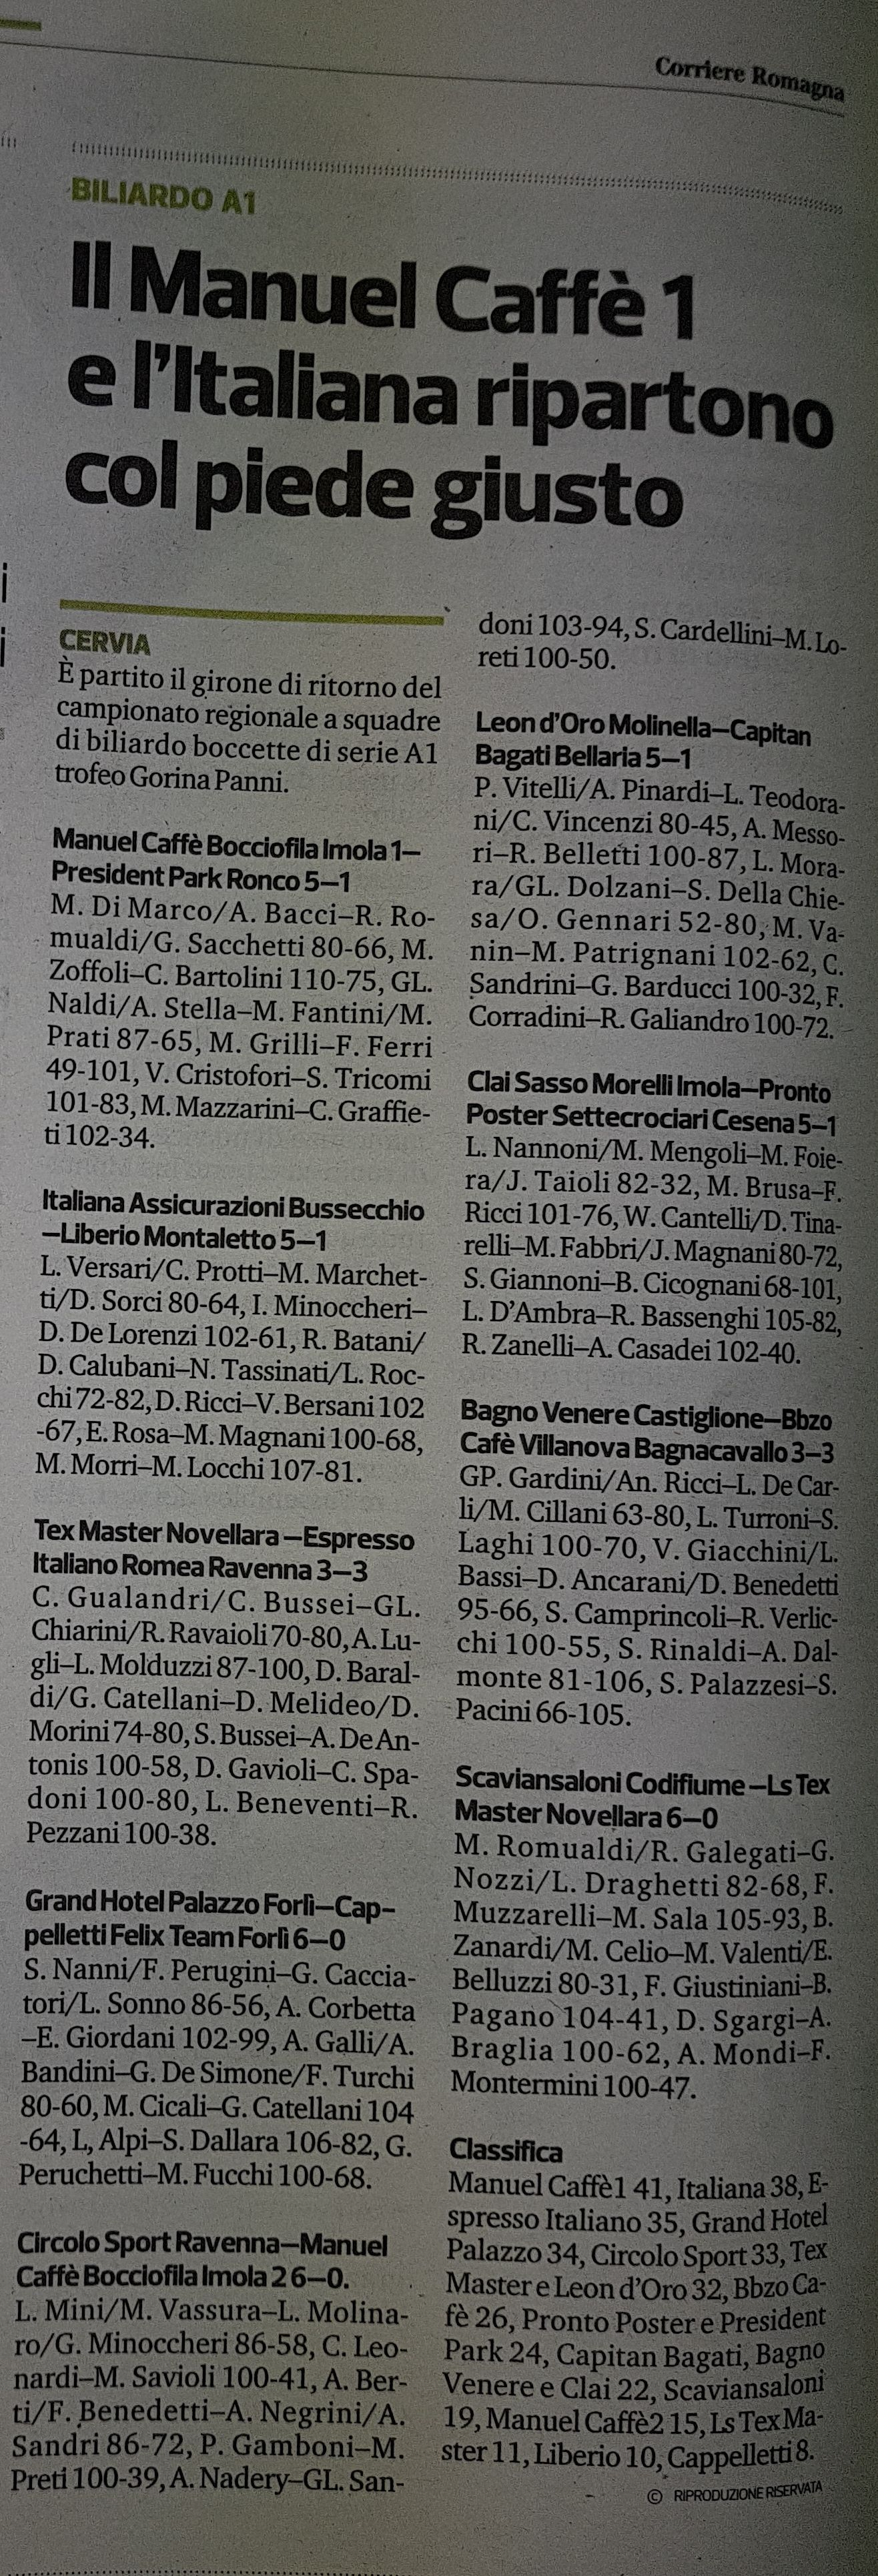 Corriere Romagna sport